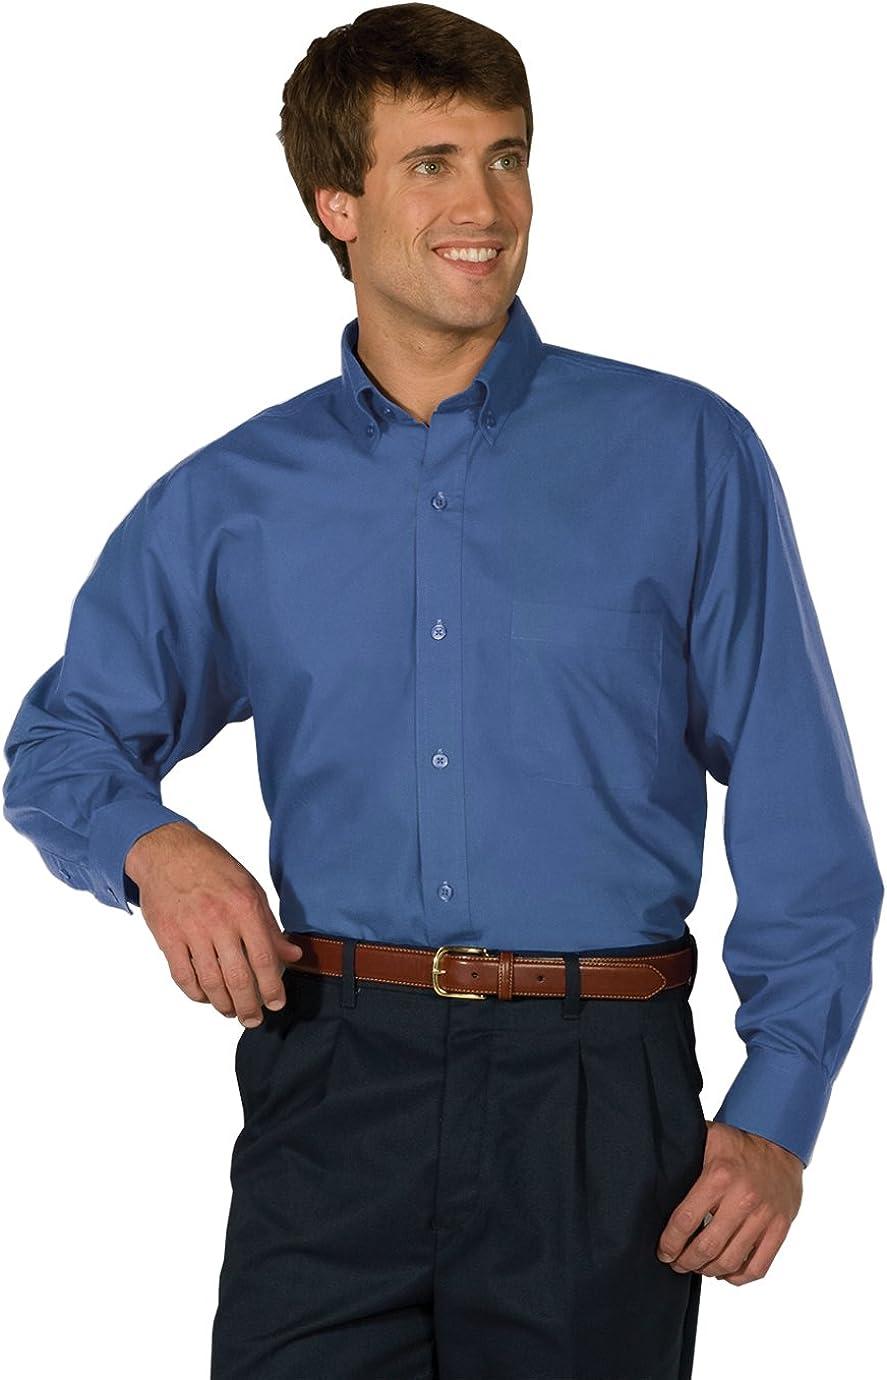 Edwards Garment Men's Big And Tall Easy Care Poplin Shirt_FRENCH BLUE_XLT